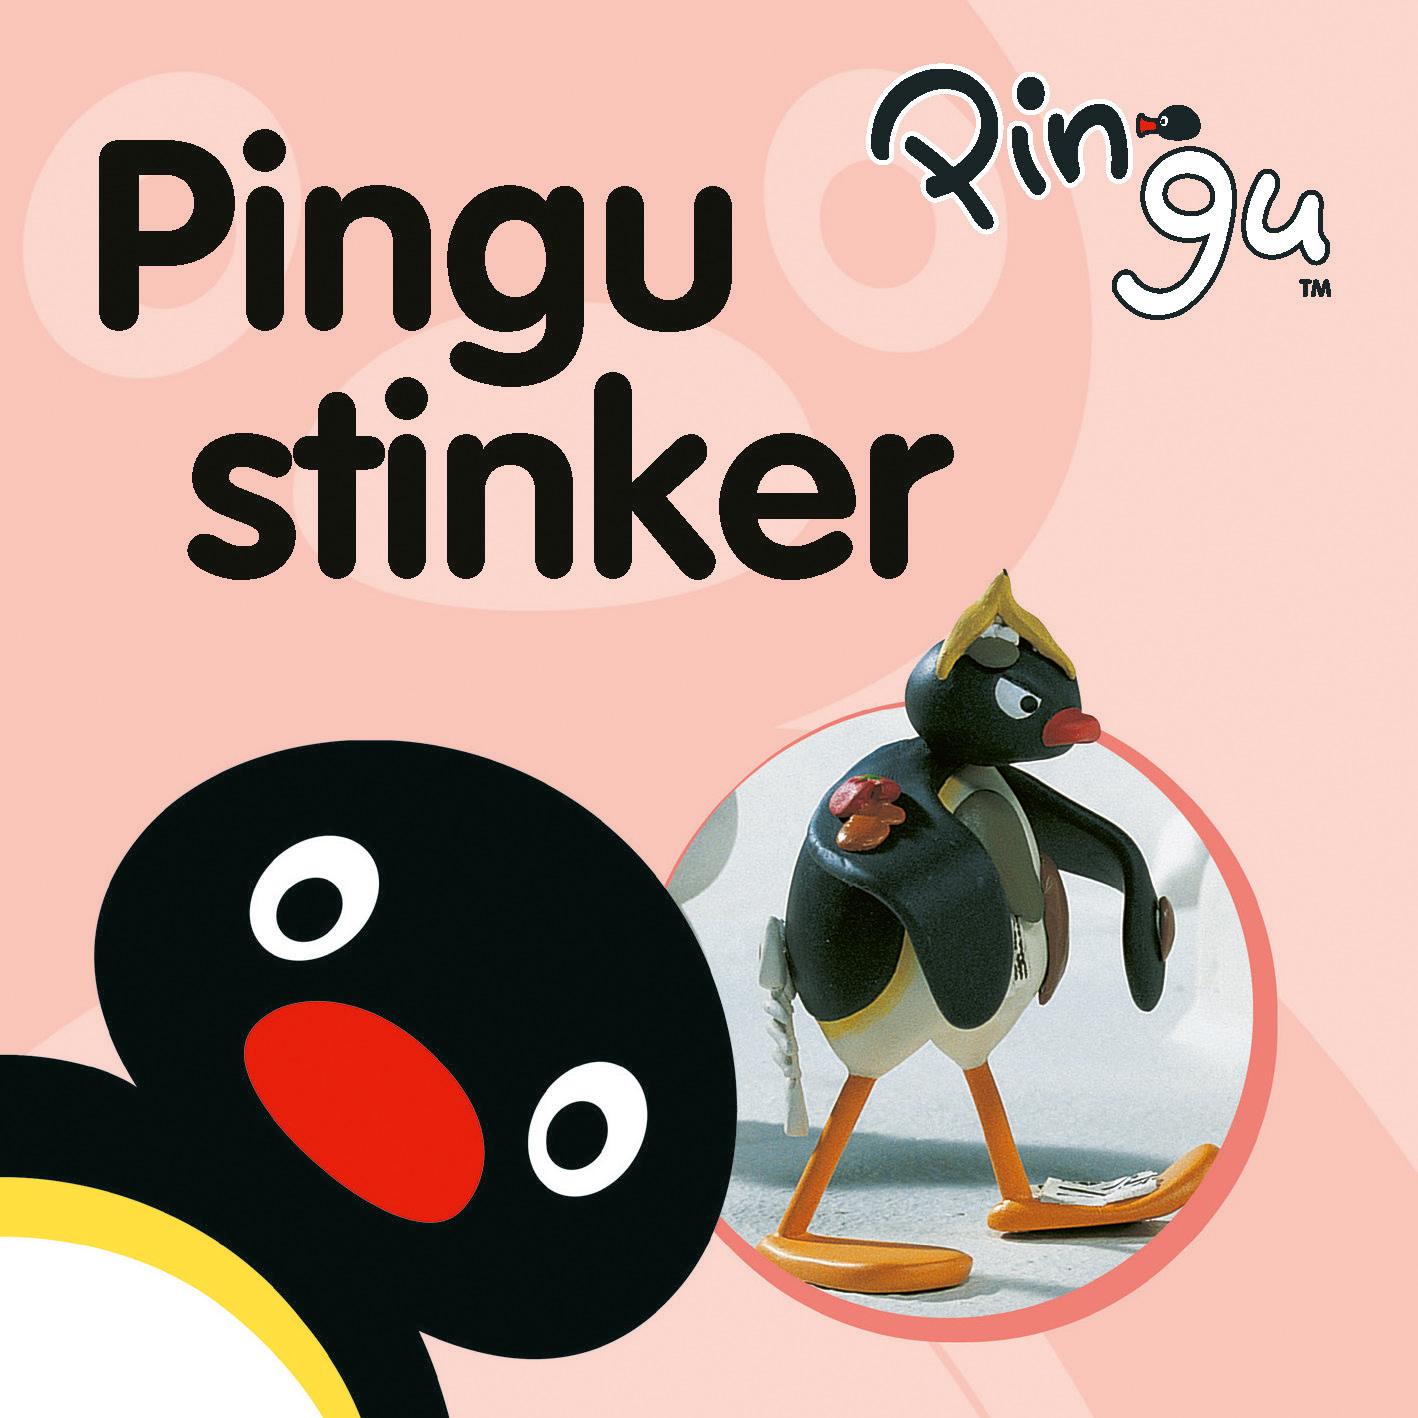 Pingu stinker